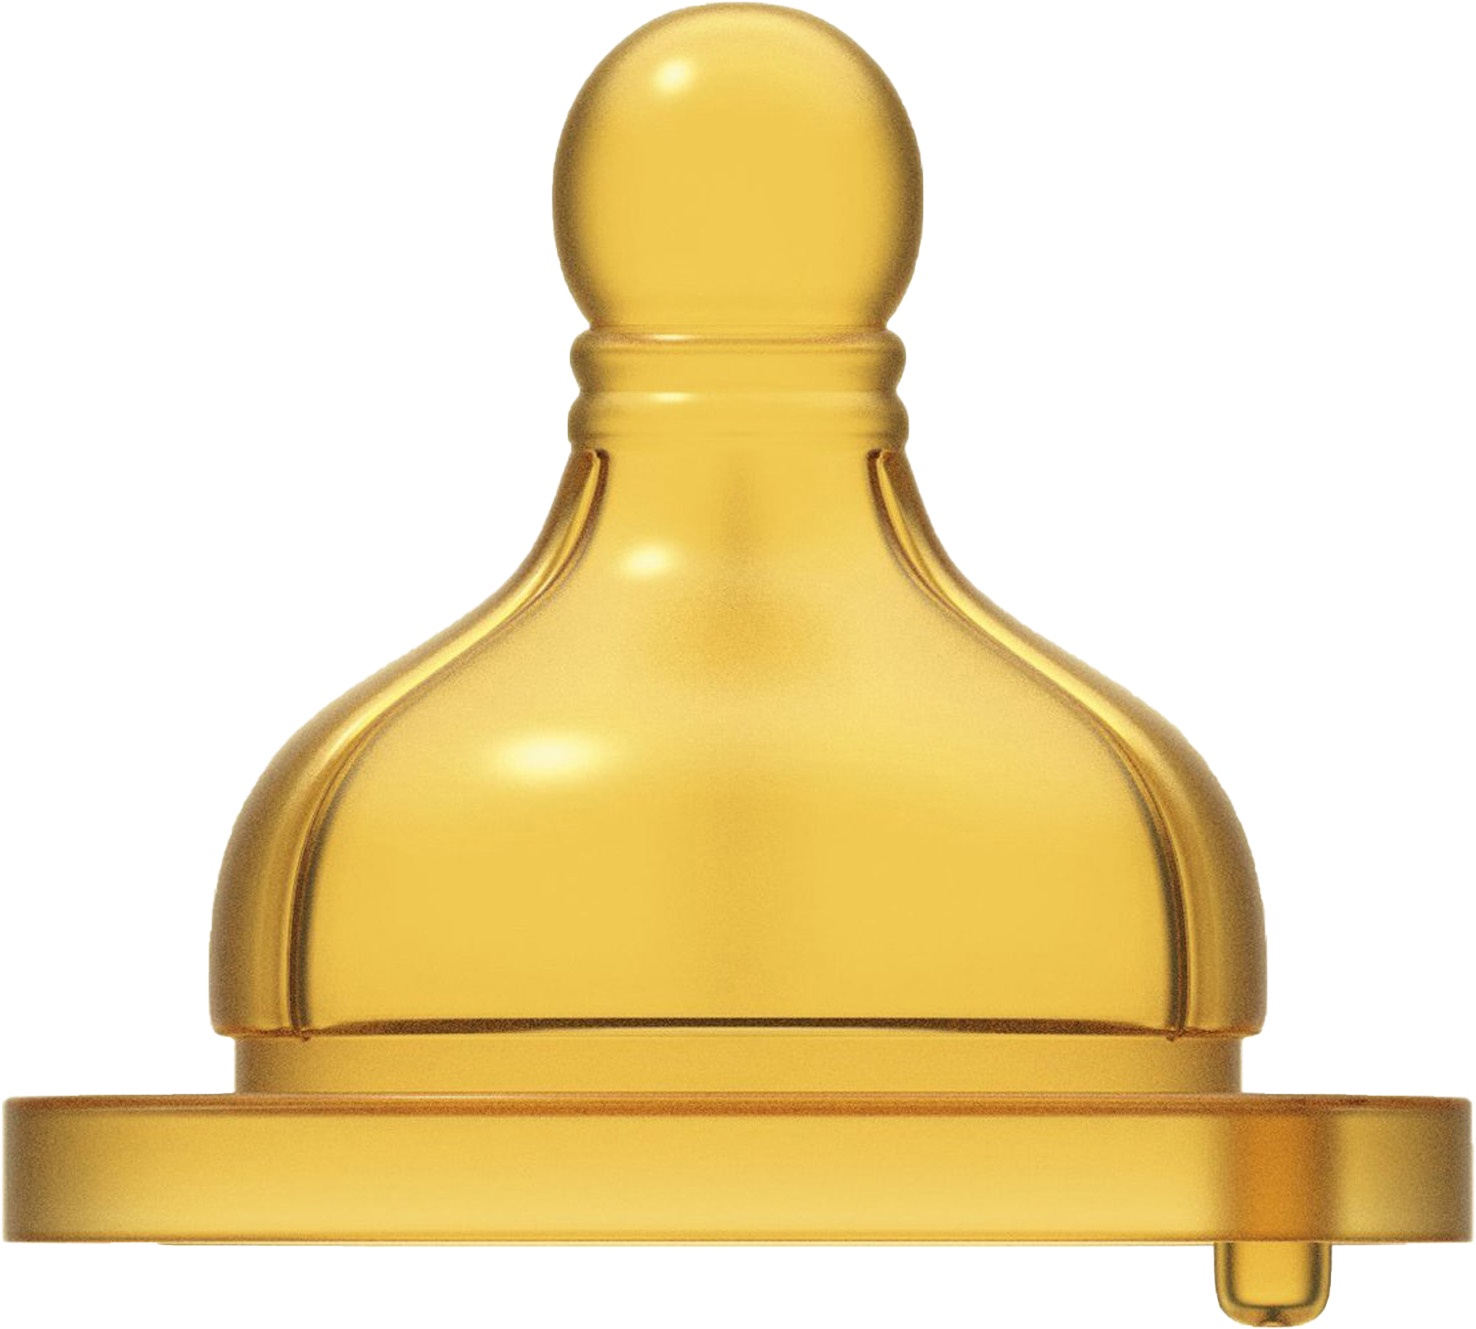 Соска Chicco Well-Being желтый соска chicco well being 2 шт латекс от 2 месяцев желтый 310205154